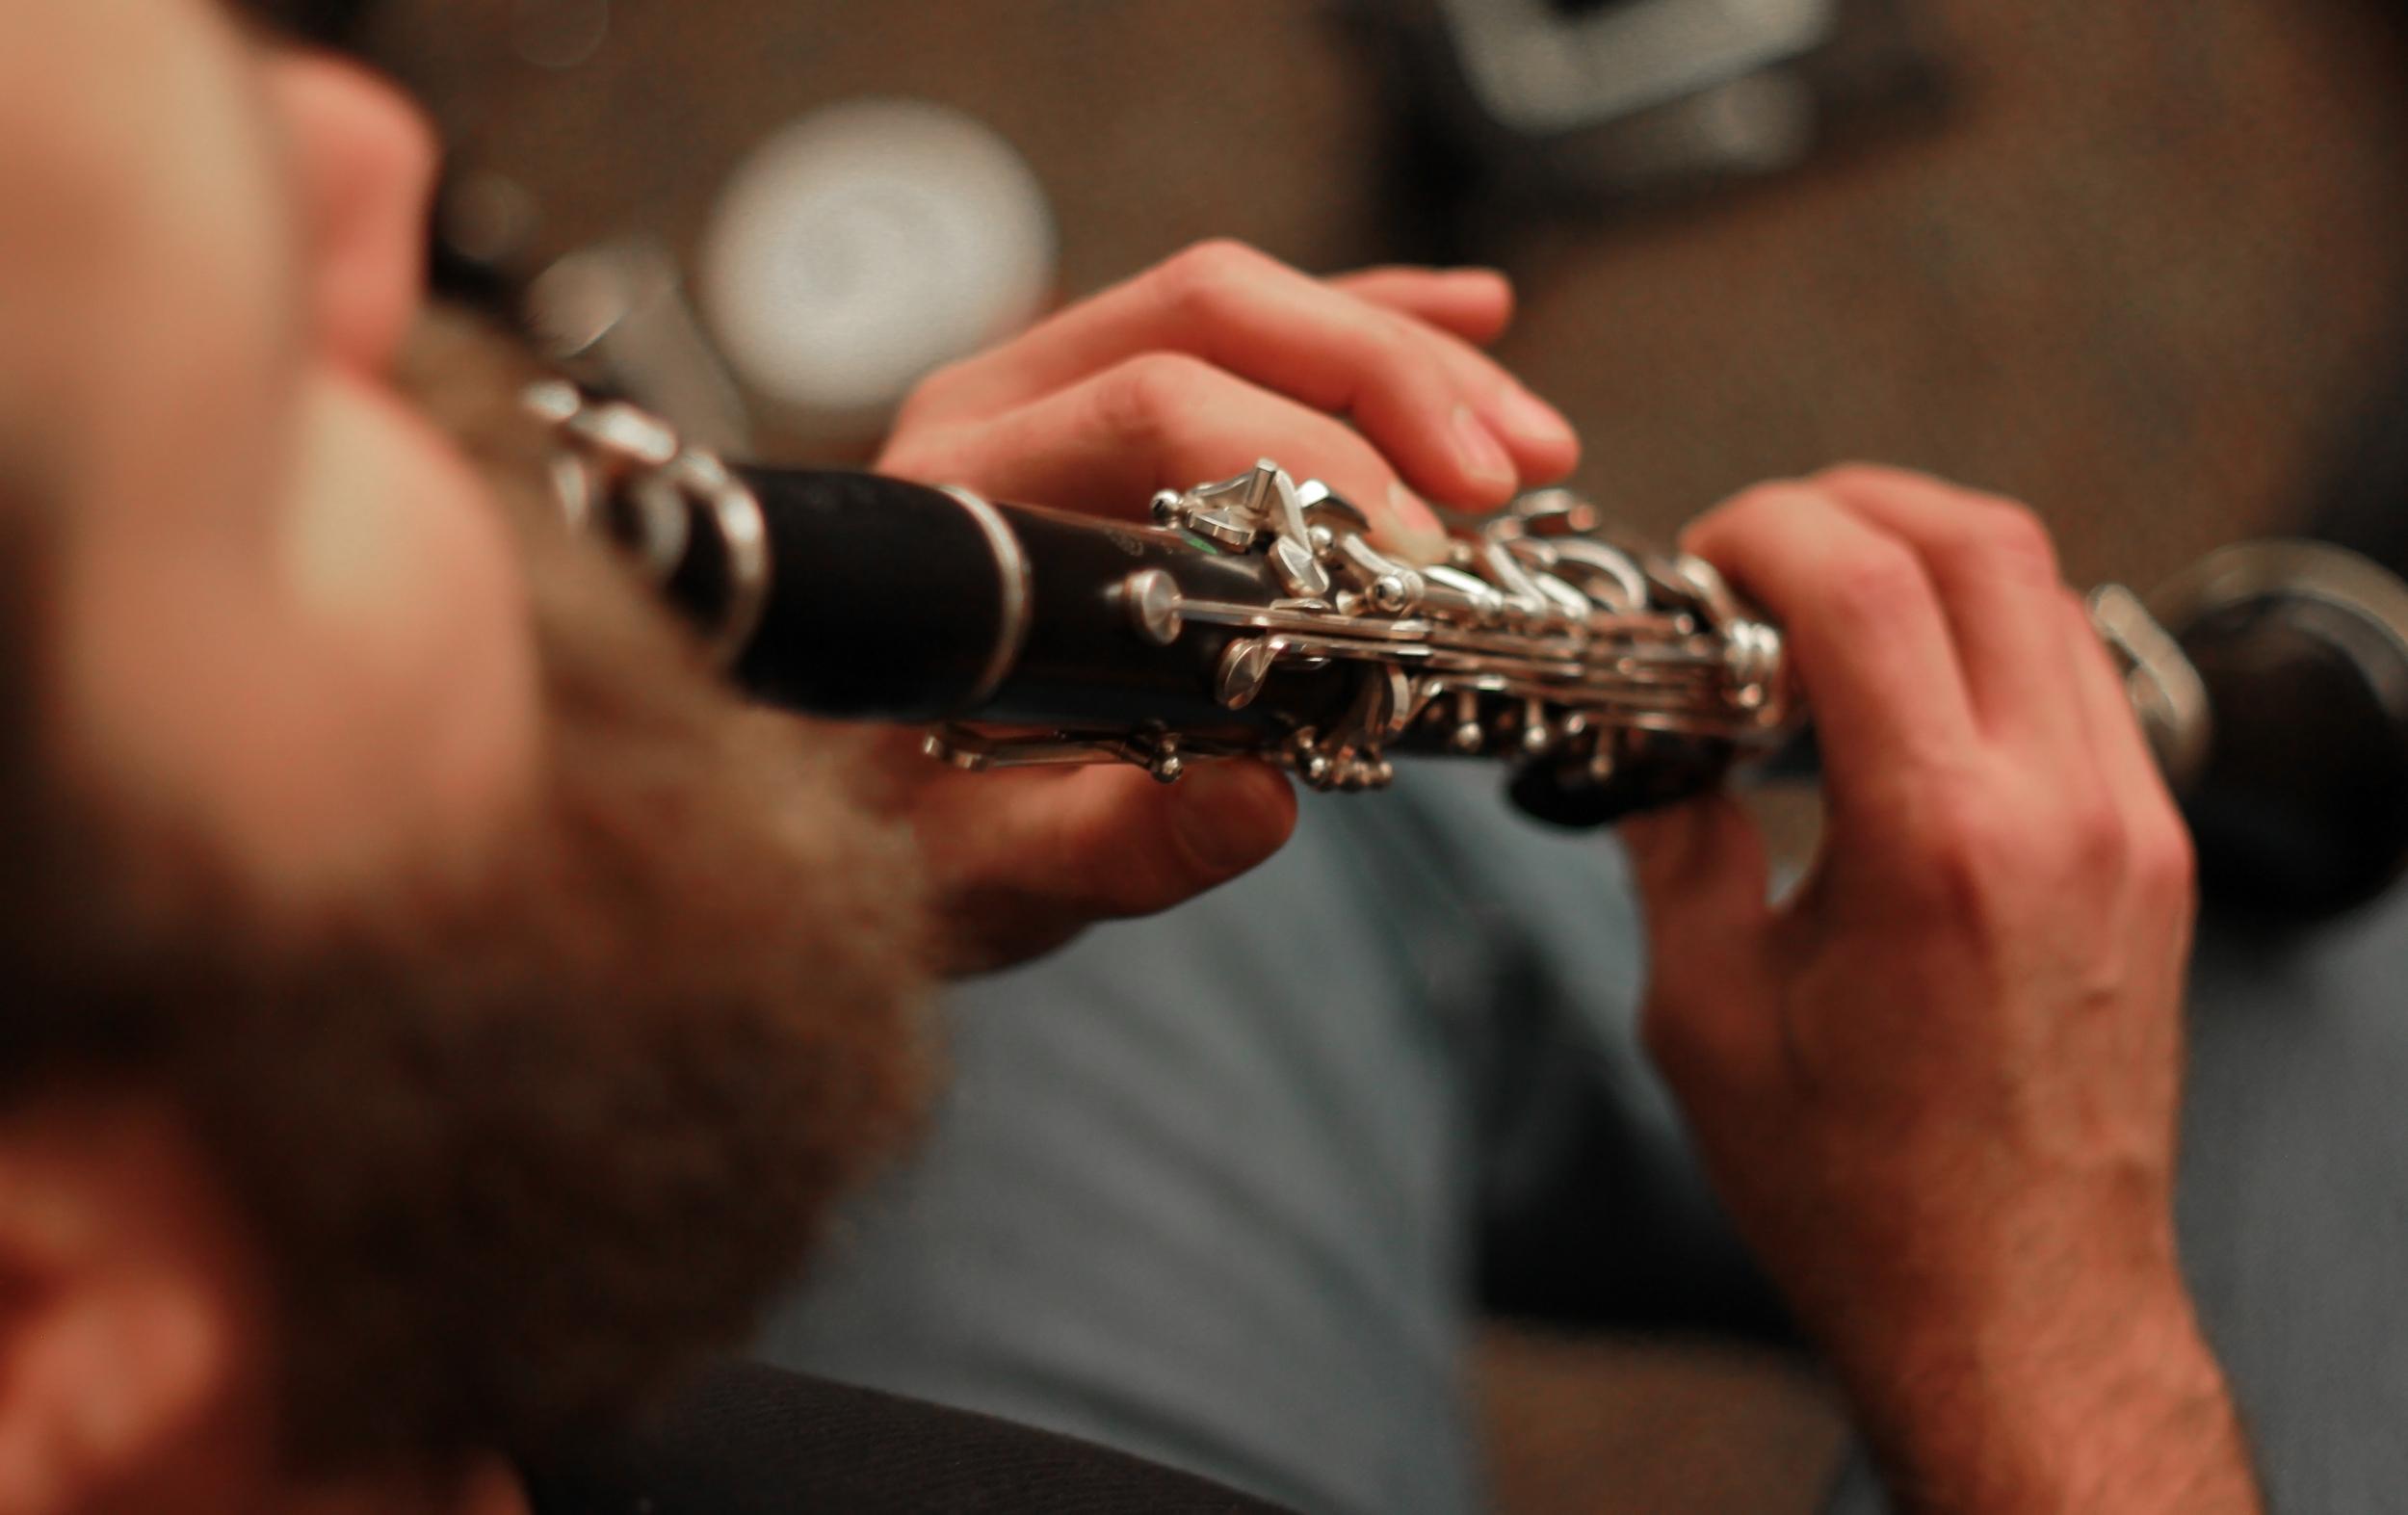 Michael Maccafarri, clarinet,eighth blackbird